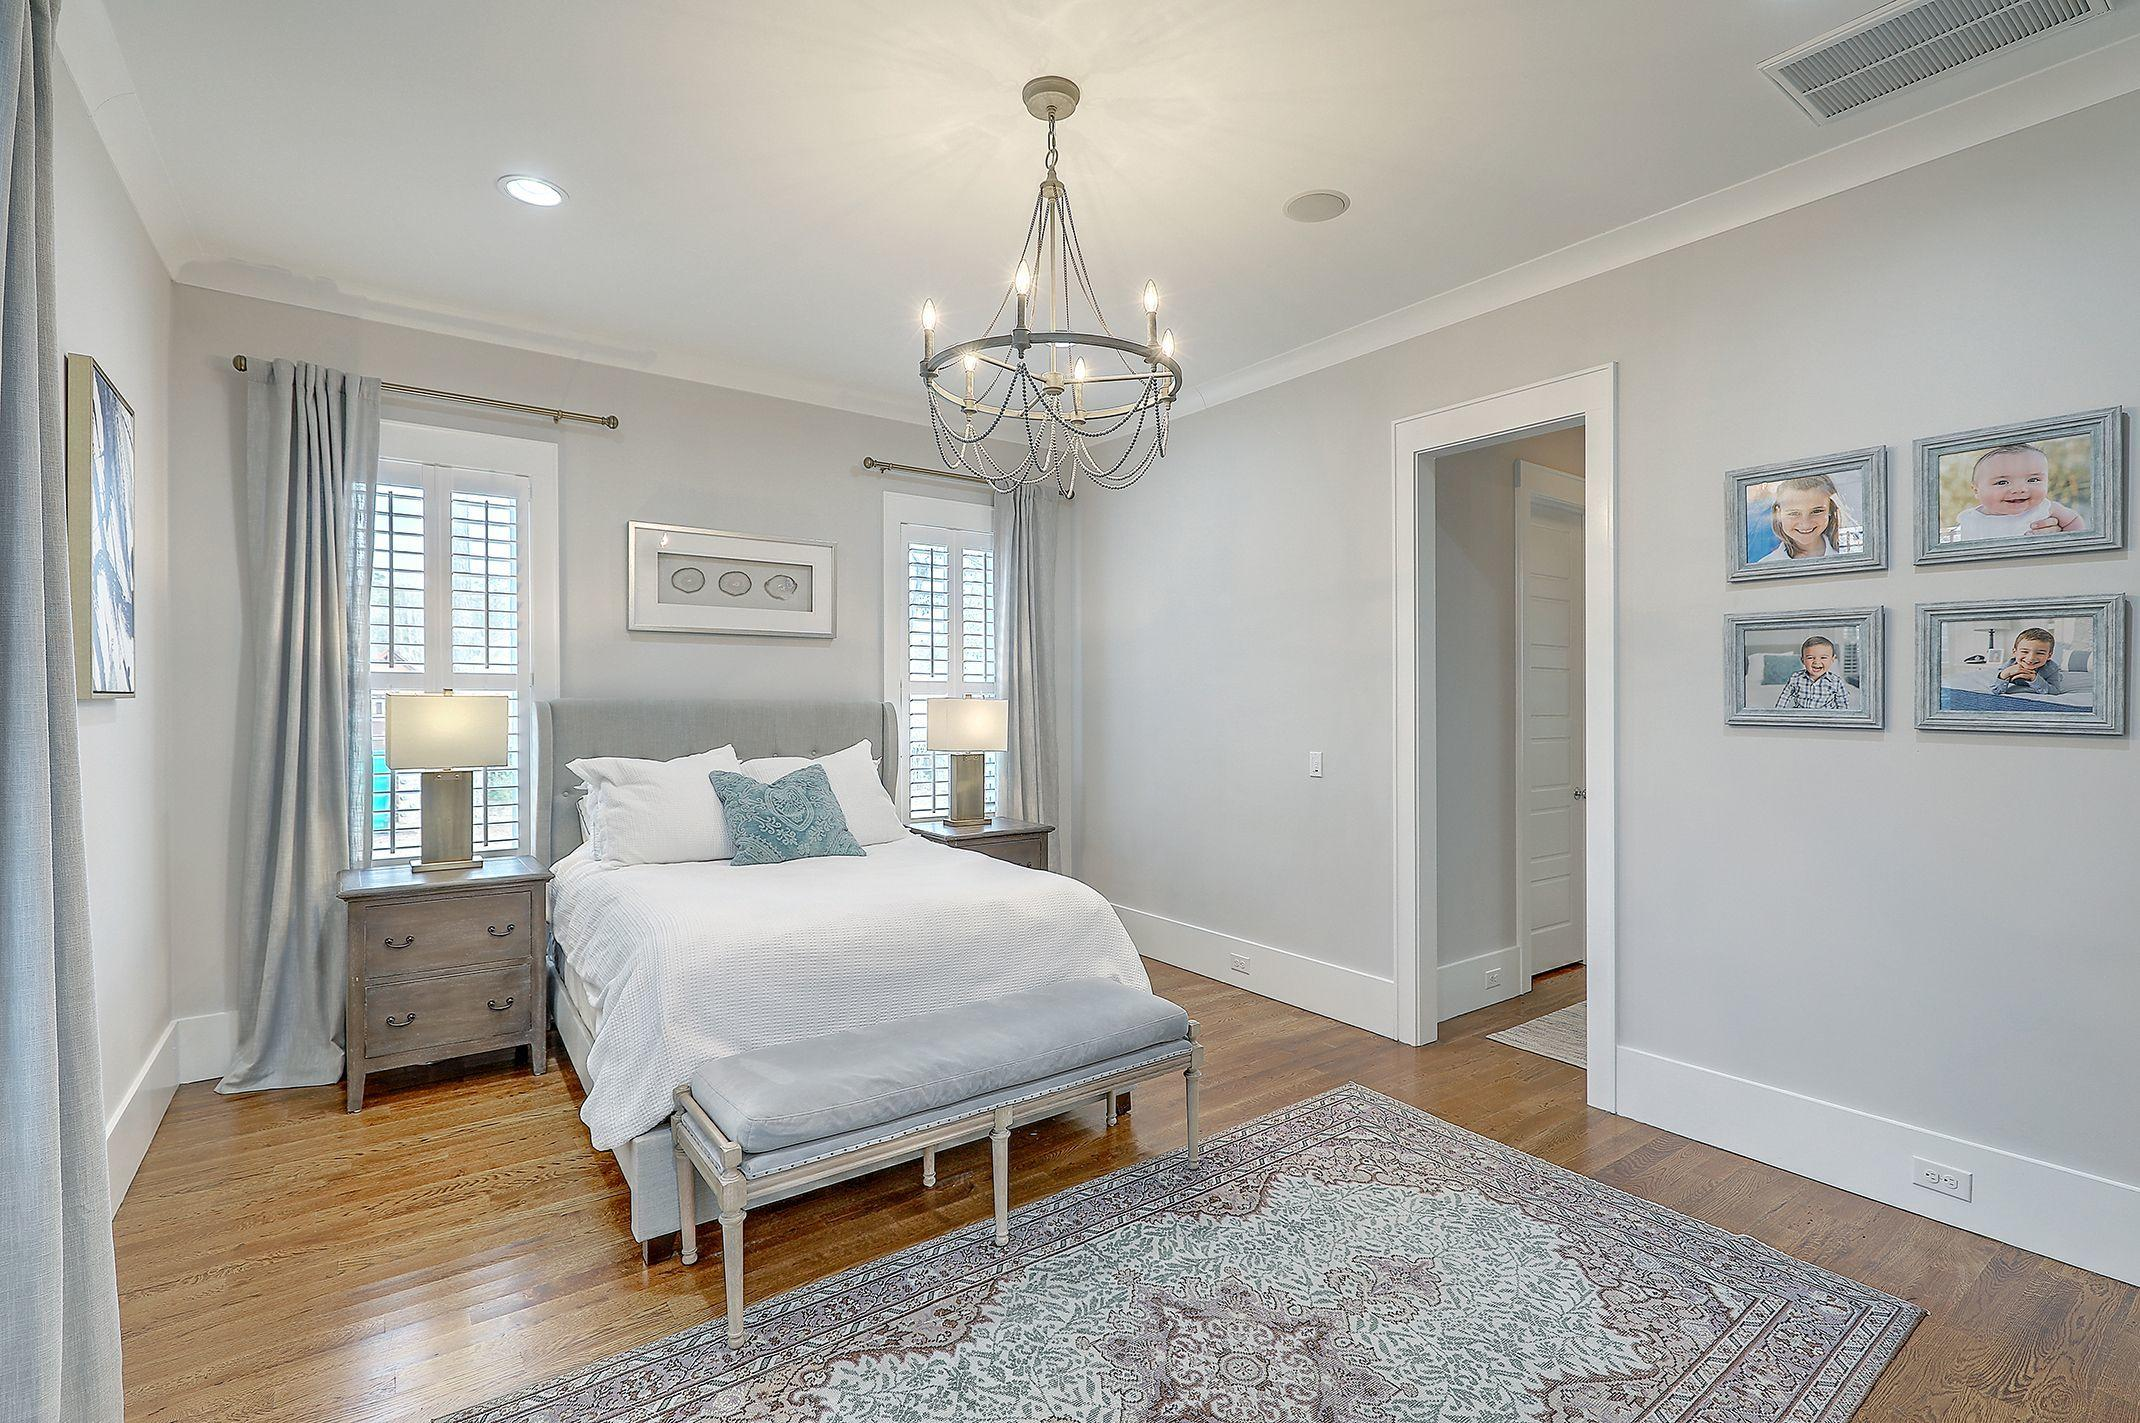 Carolina Park Homes For Sale - 1466 Gunnison, Mount Pleasant, SC - 52